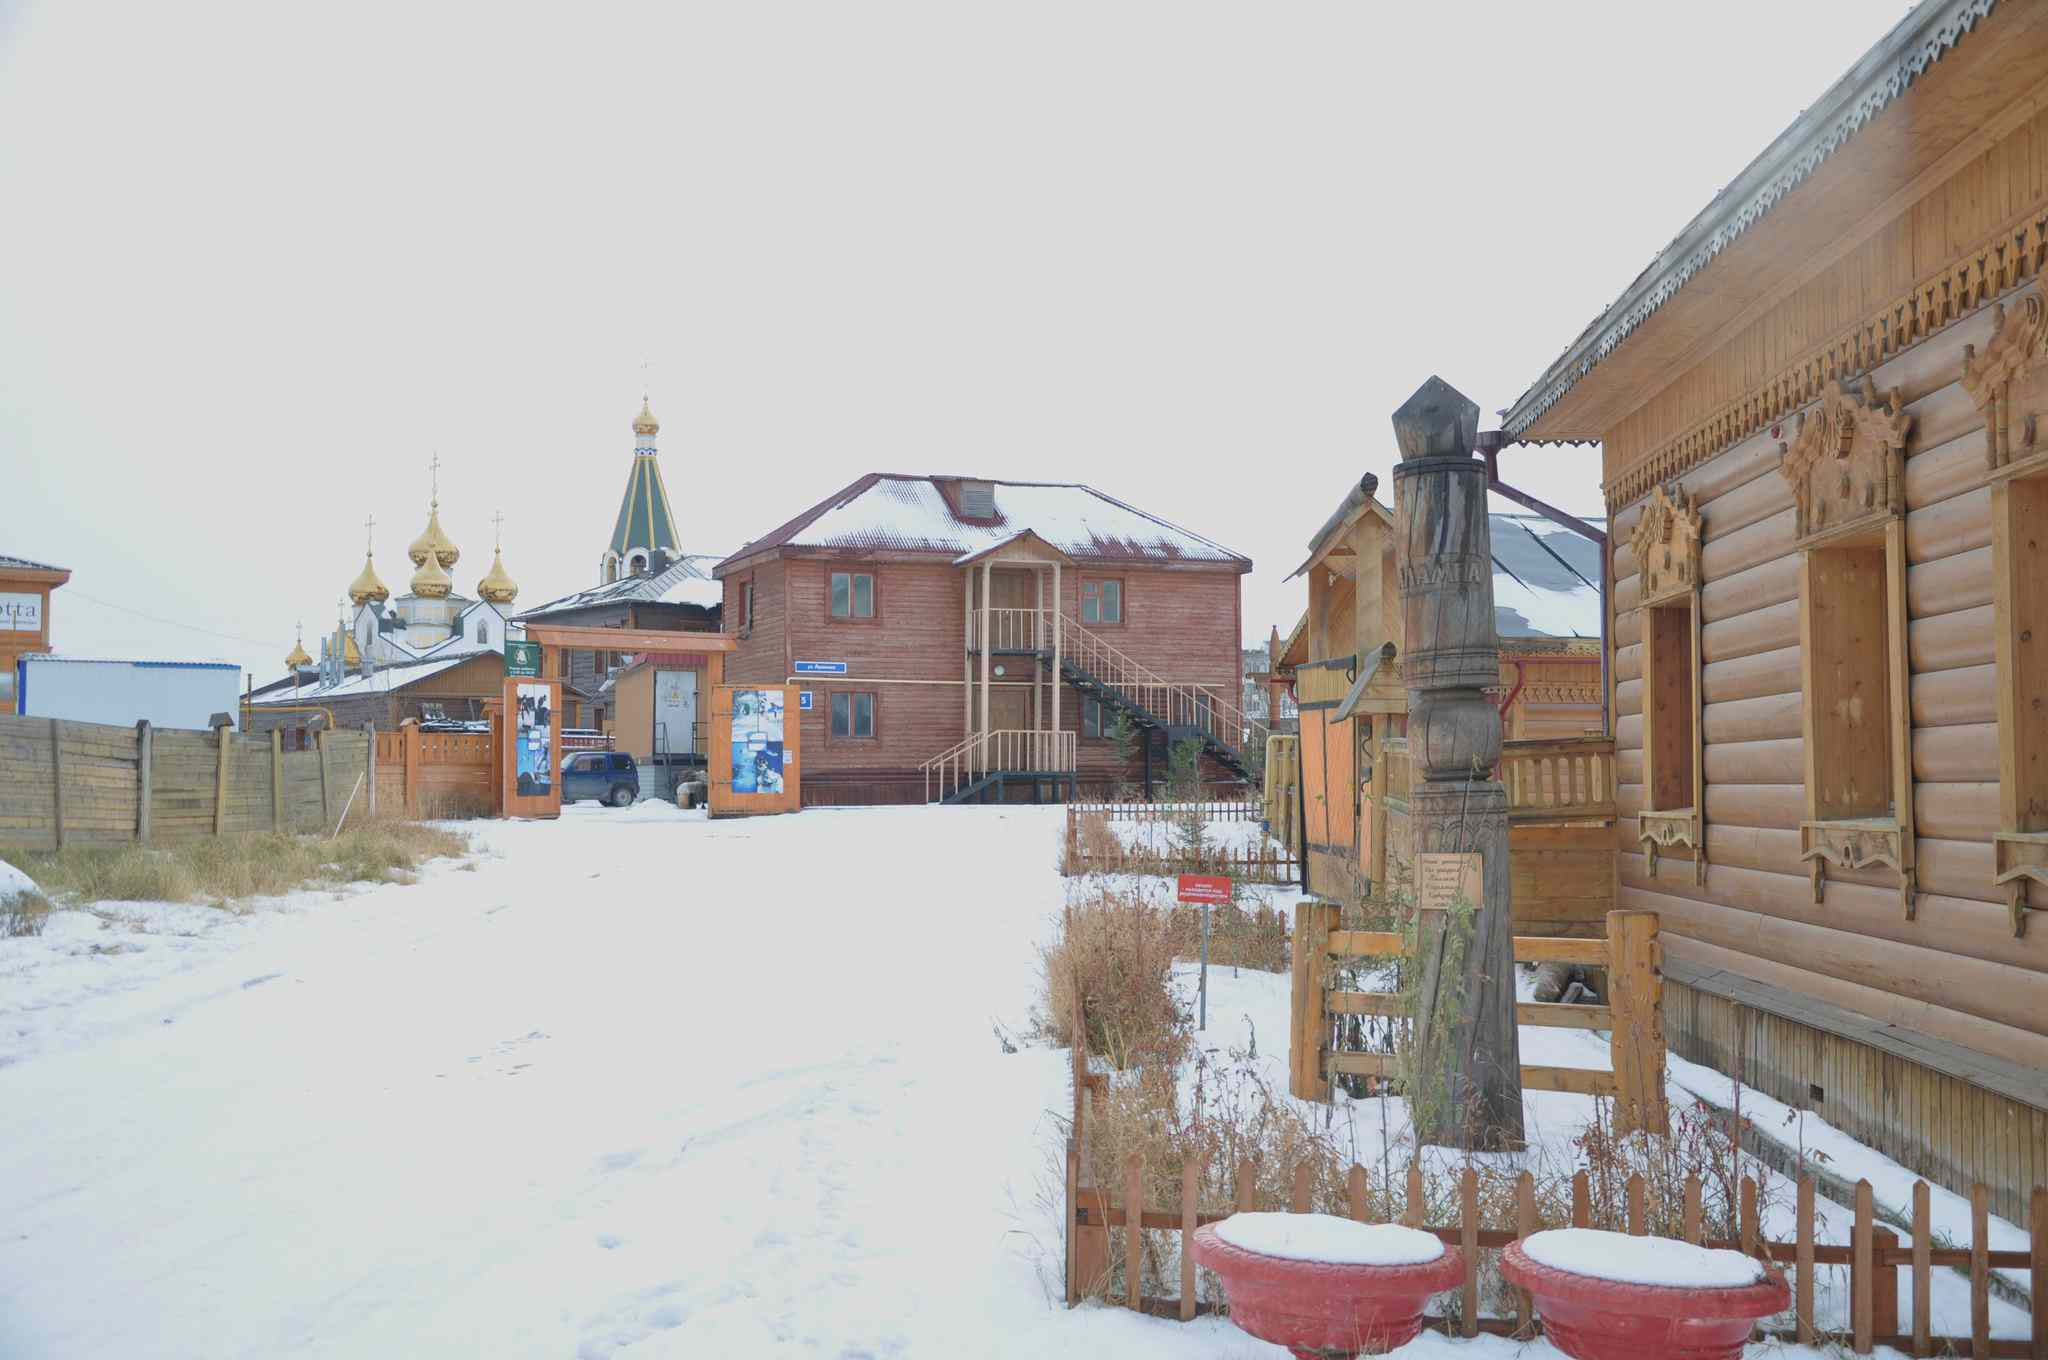 Snowy village of Yakutsk, Russia